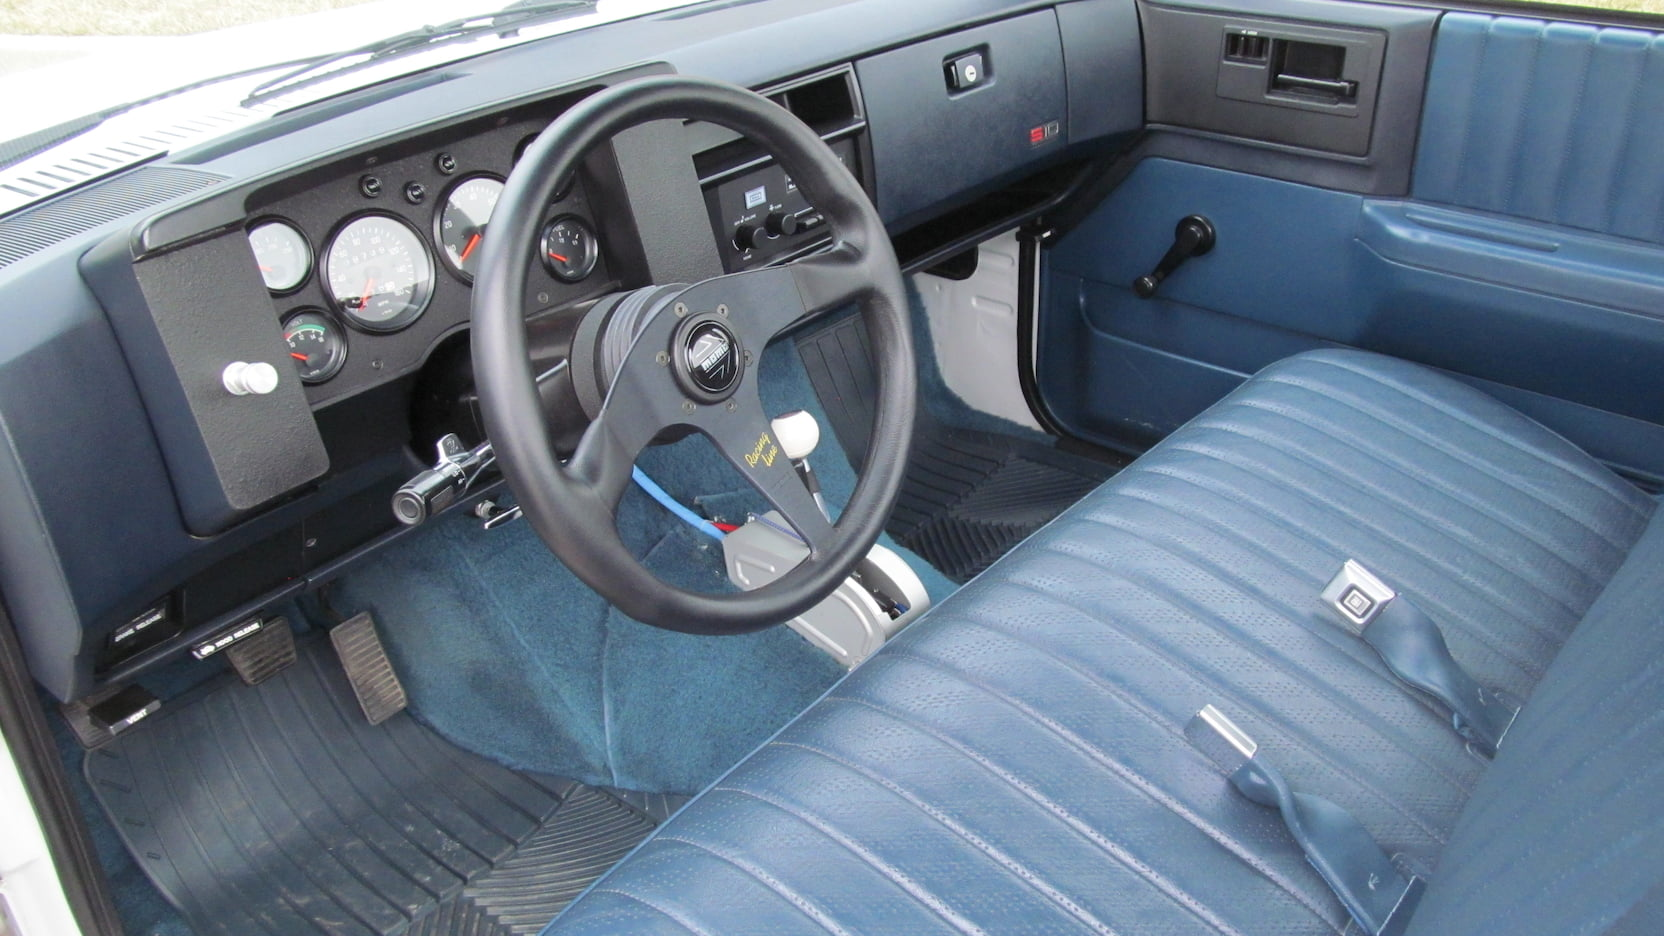 1987 Chevrolet S10 interior